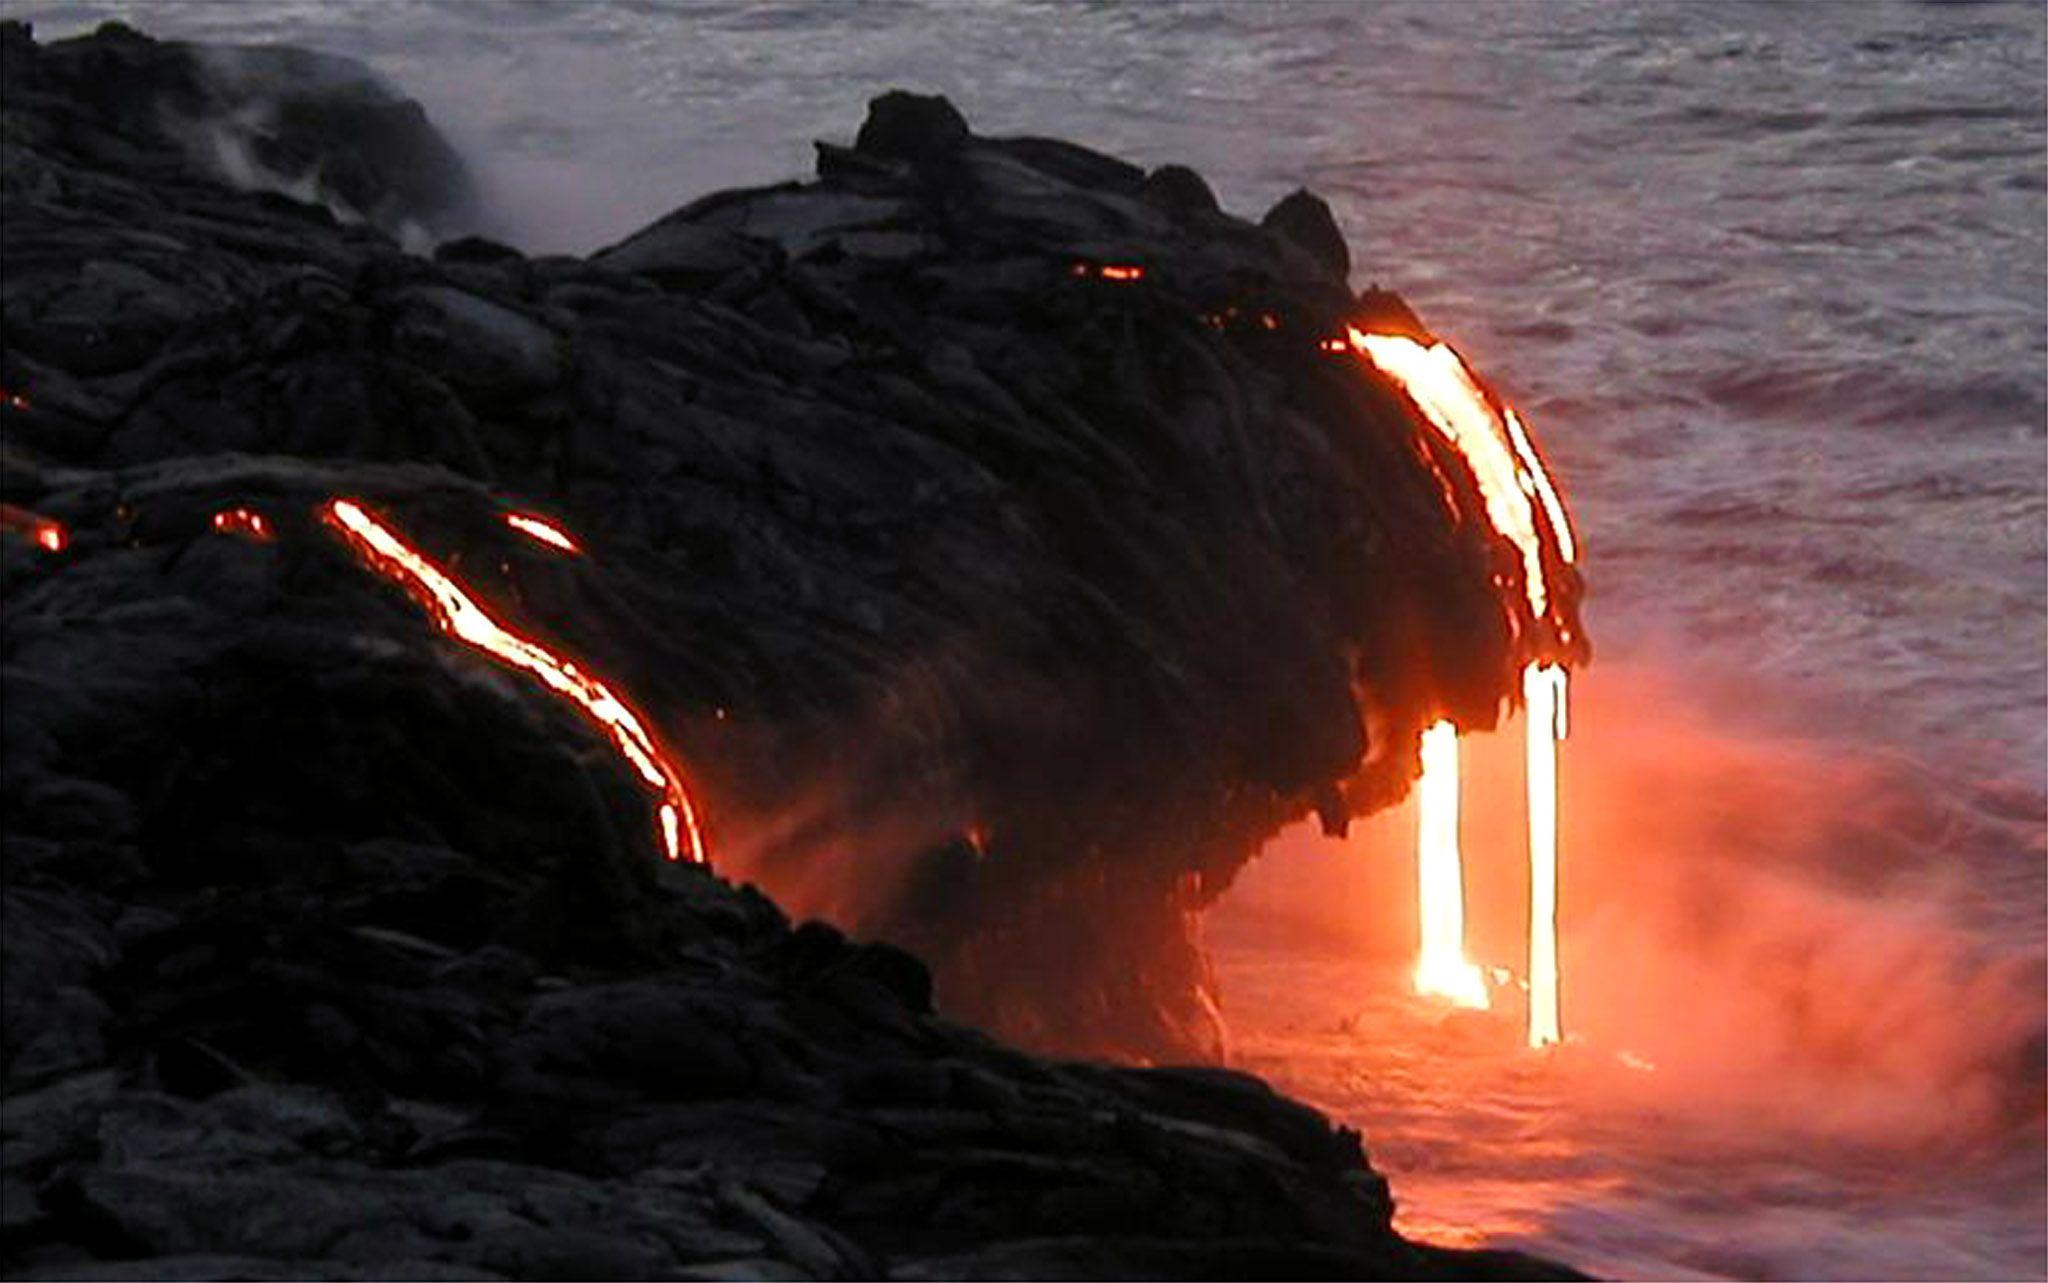 Photos Amp Video Kilauea Volcano Lava Flow In Hawaii Nears Homes